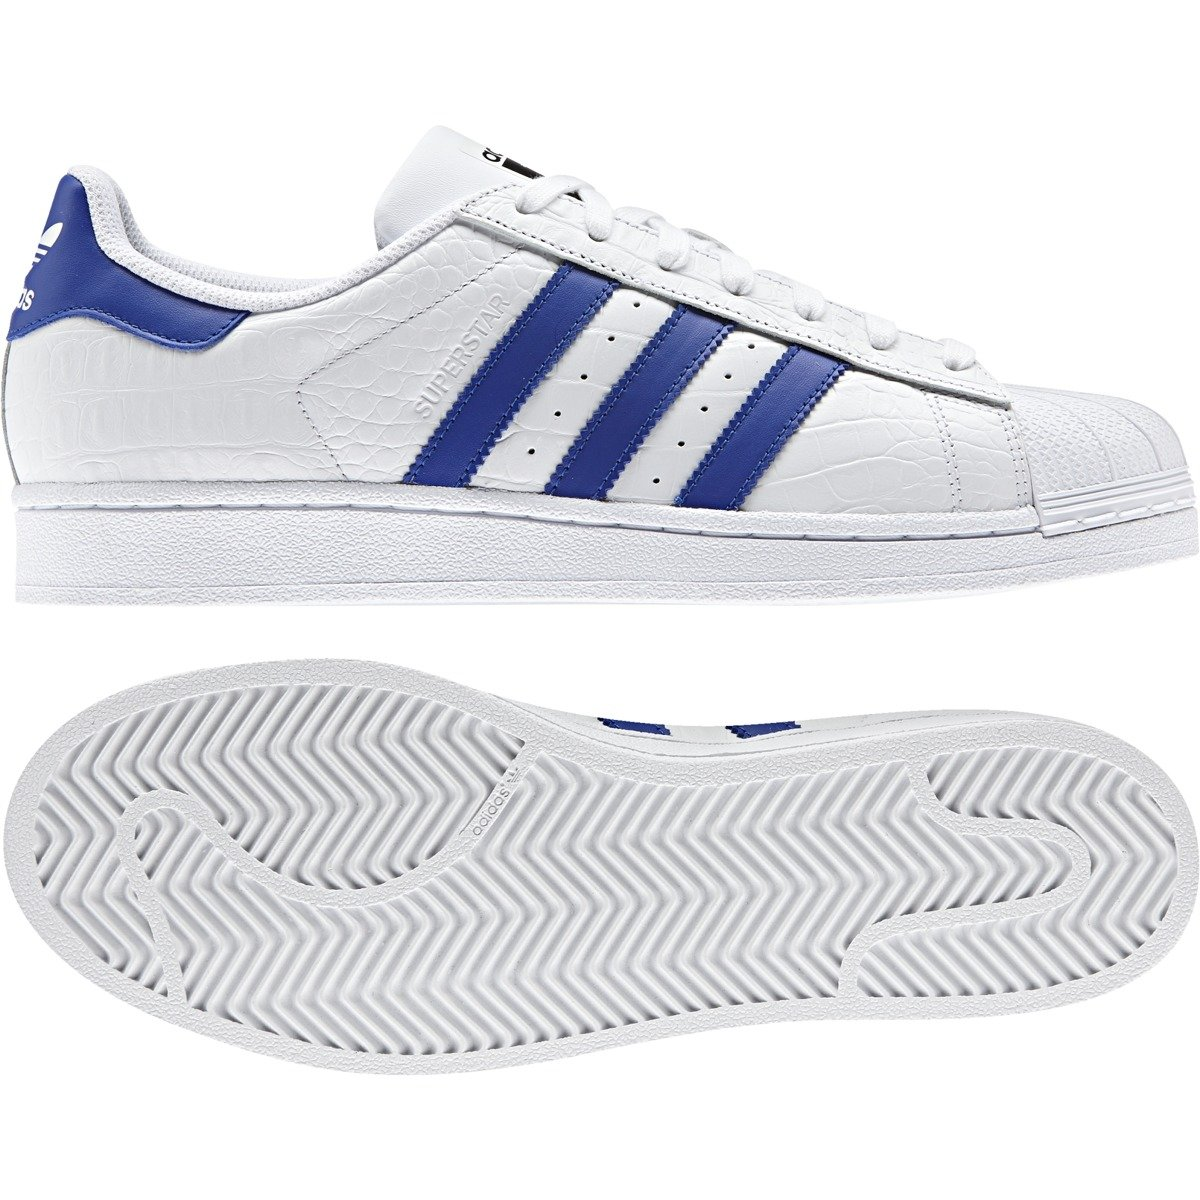 BZ0197 Adidas Chaussures Originals Adidas Superstar Originals Chaussures Superstar Adidas BZ0197 nvwFxwazRq